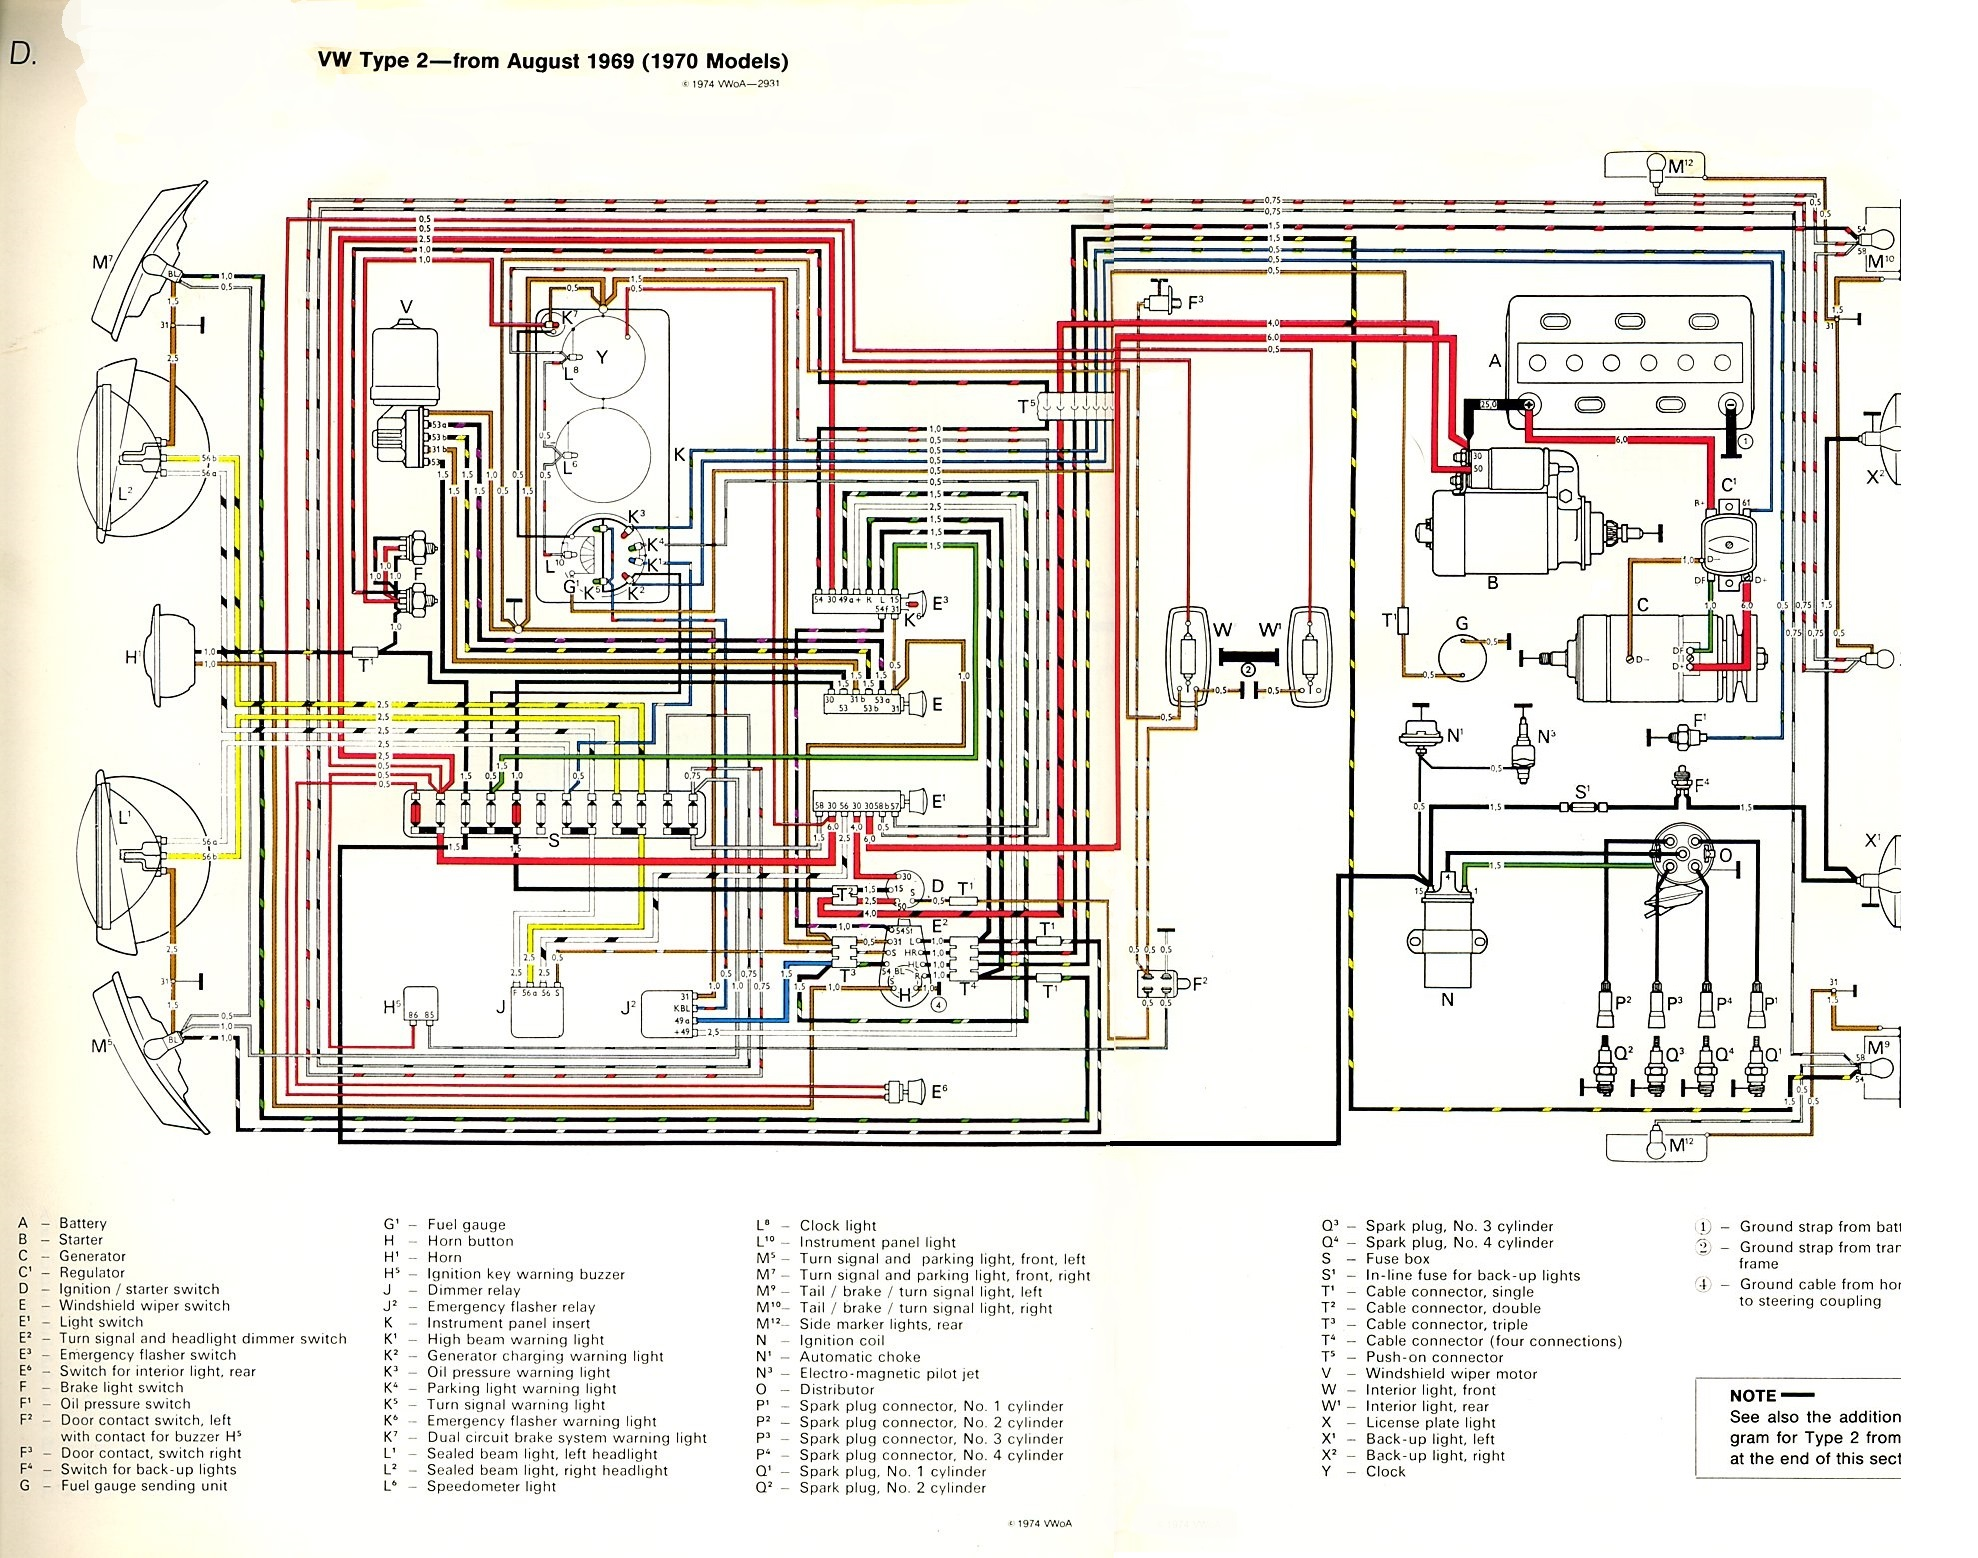 ignition switch wiring diagram chevy impala 1957 chevy headlight wiring diagram wiring diagram data  1957 chevy headlight wiring diagram